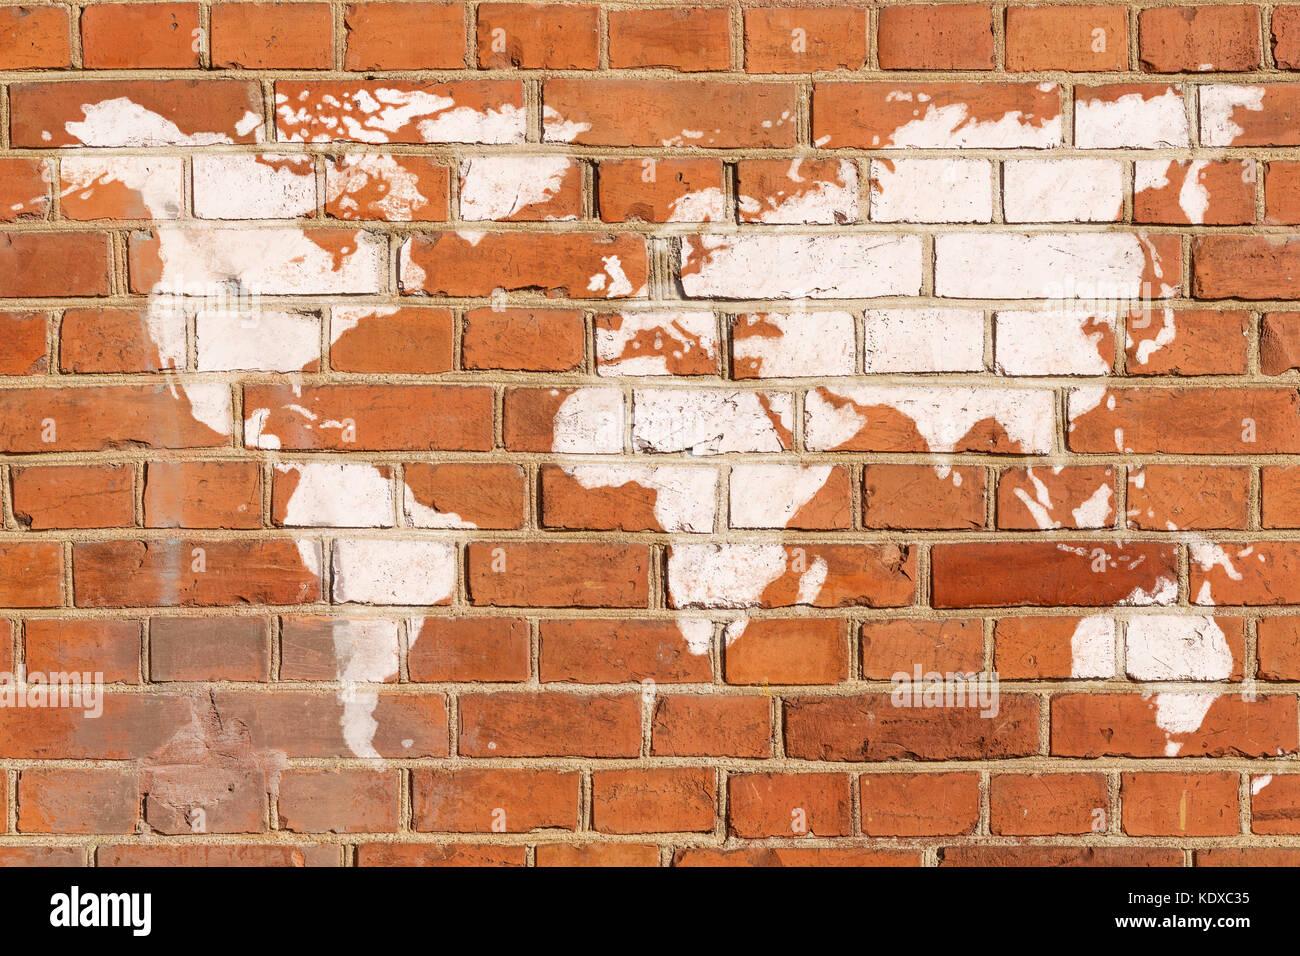 Antique brick wall with world map graffiti stock photo 163464089 antique brick wall with world map graffiti gumiabroncs Choice Image